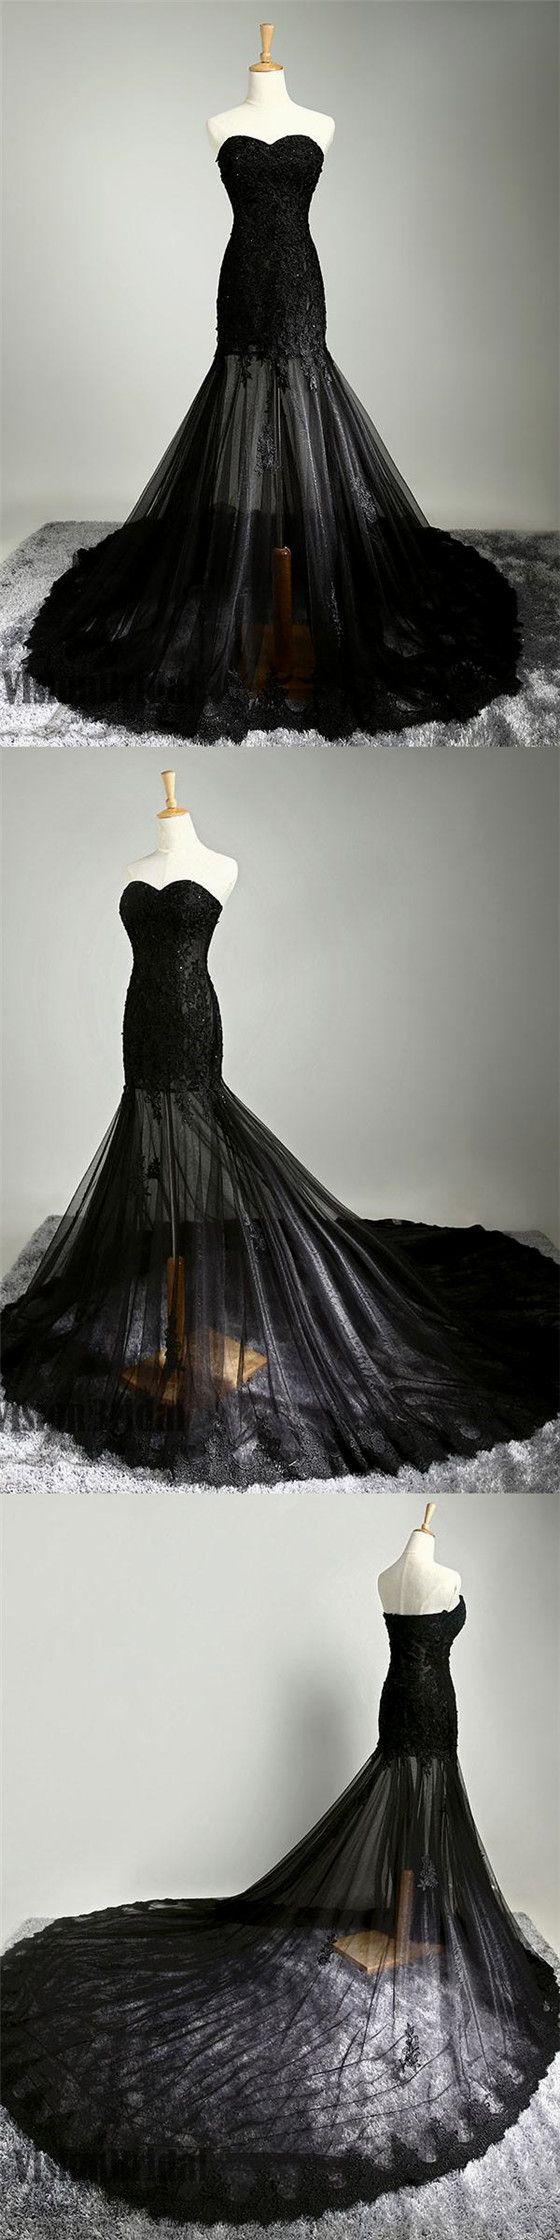 best cute clothes images on pinterest ballroom dress chiffon